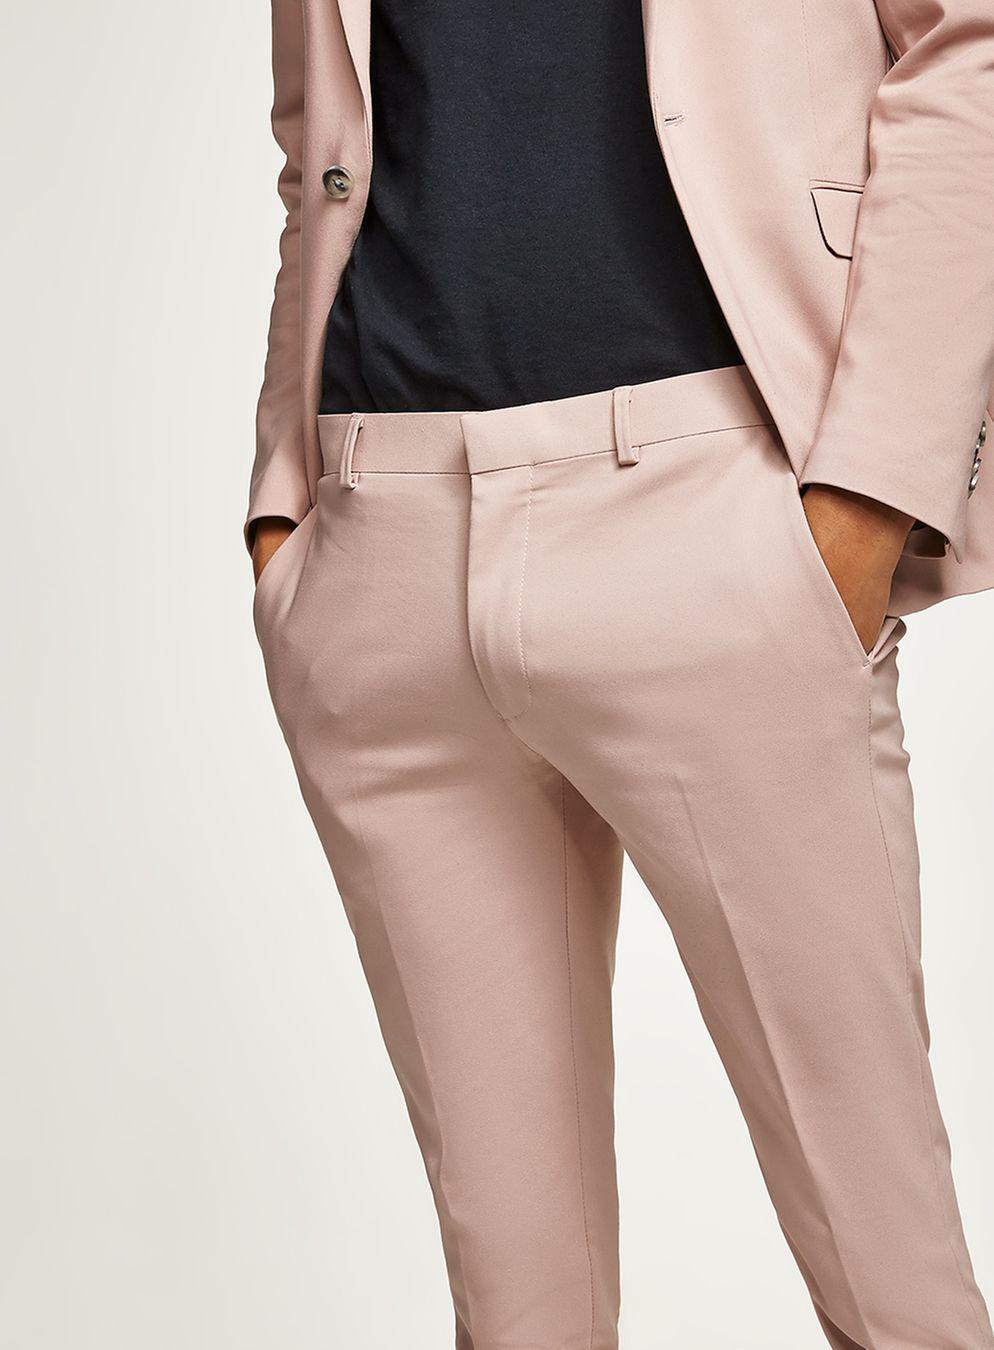 Topman Dusty Rose Skinny Suit Pant in Pink for Men - Lyst